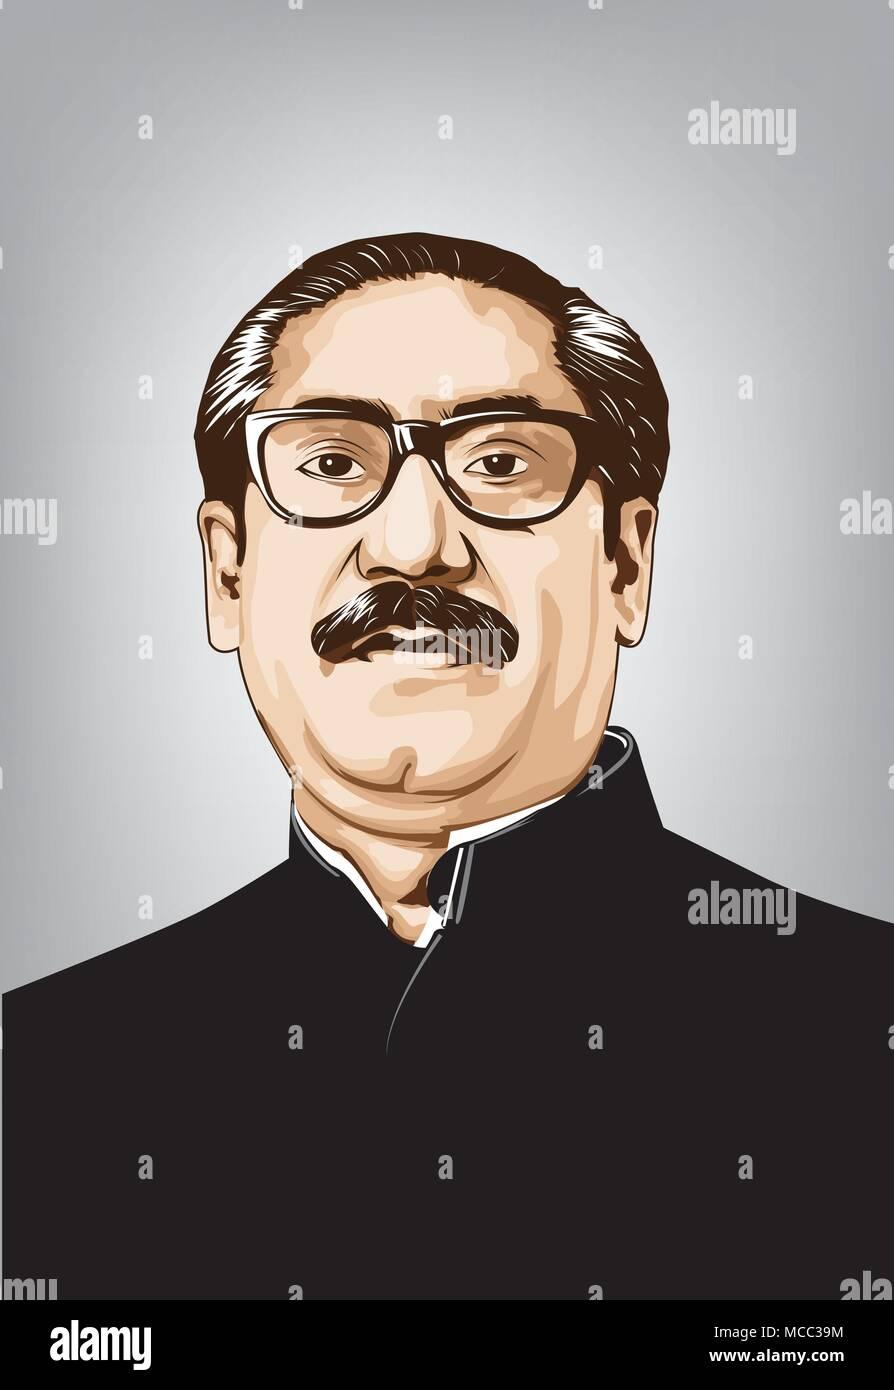 Sheikh Mujibur Rahman(1920-1975)1st and 4th President of Bangladesh-Bengali politician and statesman-He is known Bangabandhu-vector image. - Stock Image